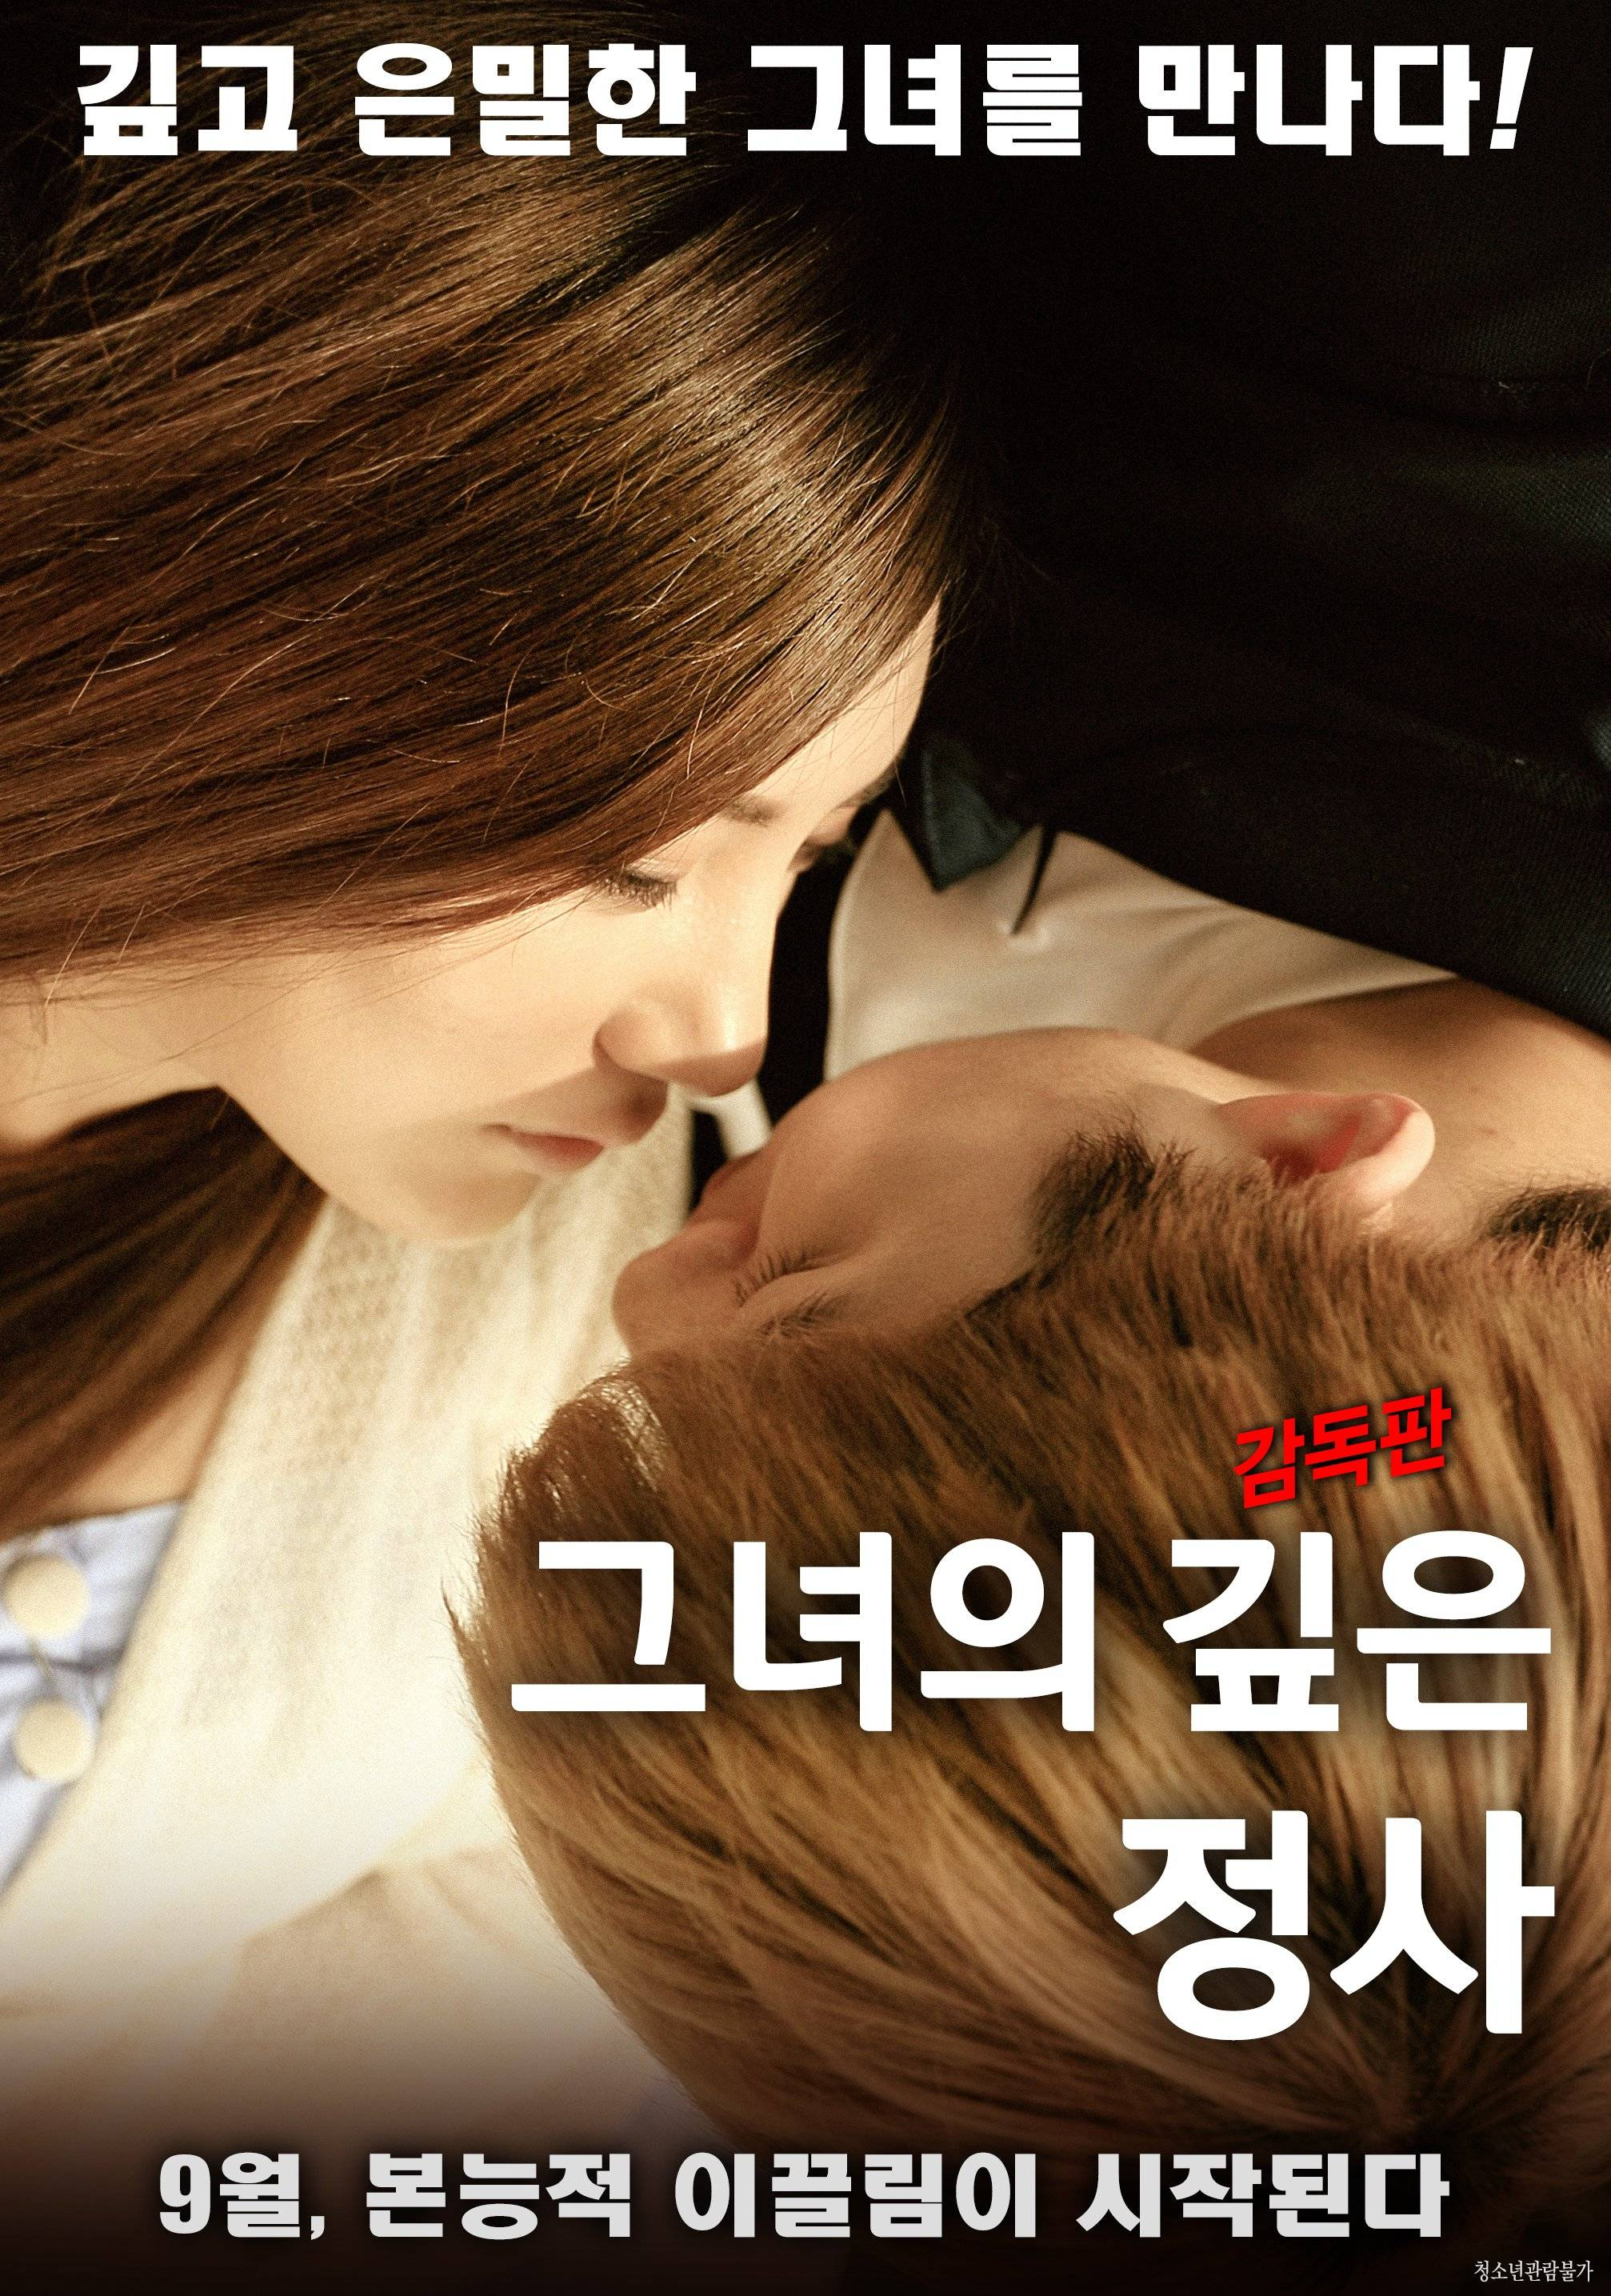 Her Deep Love Affair 2017 Full Movie